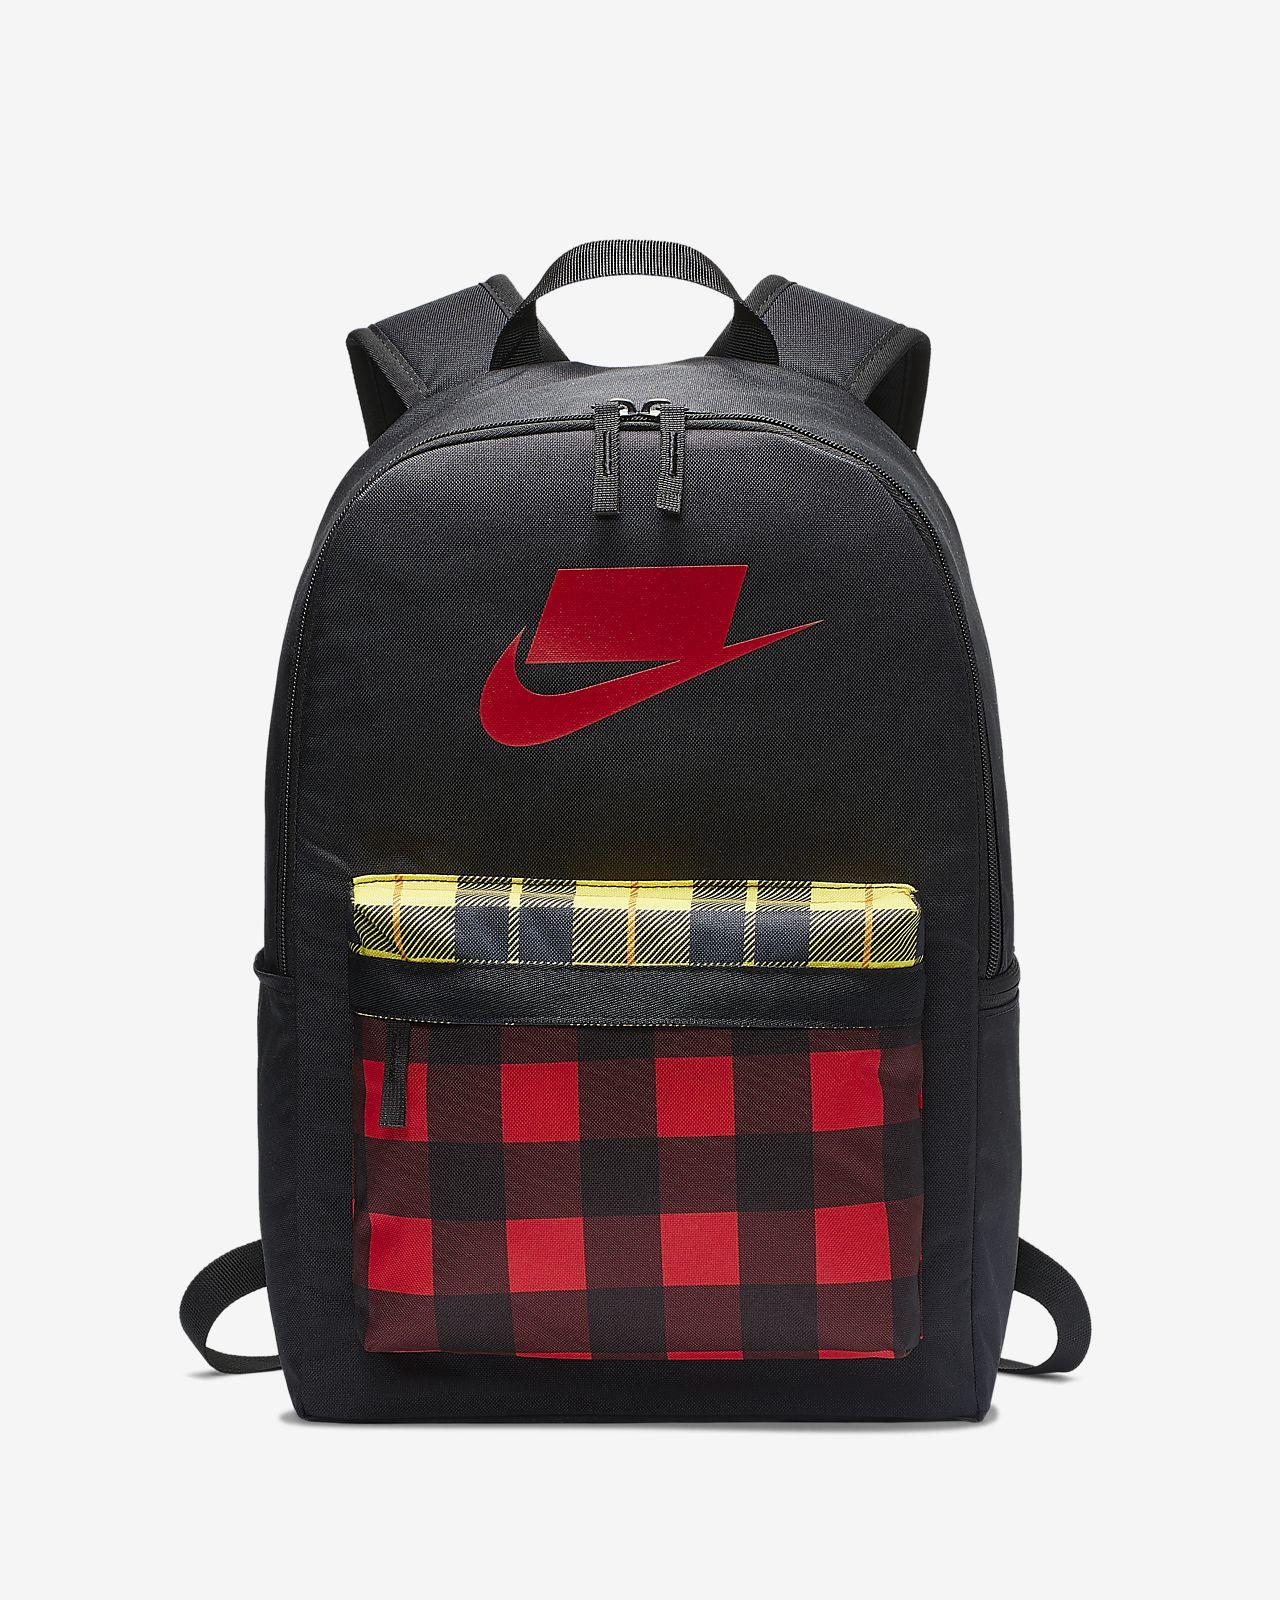 9403f98757f2 Low Resolution Nike Heritage 2.0 hátizsák Nike Heritage 2.0 hátizsák